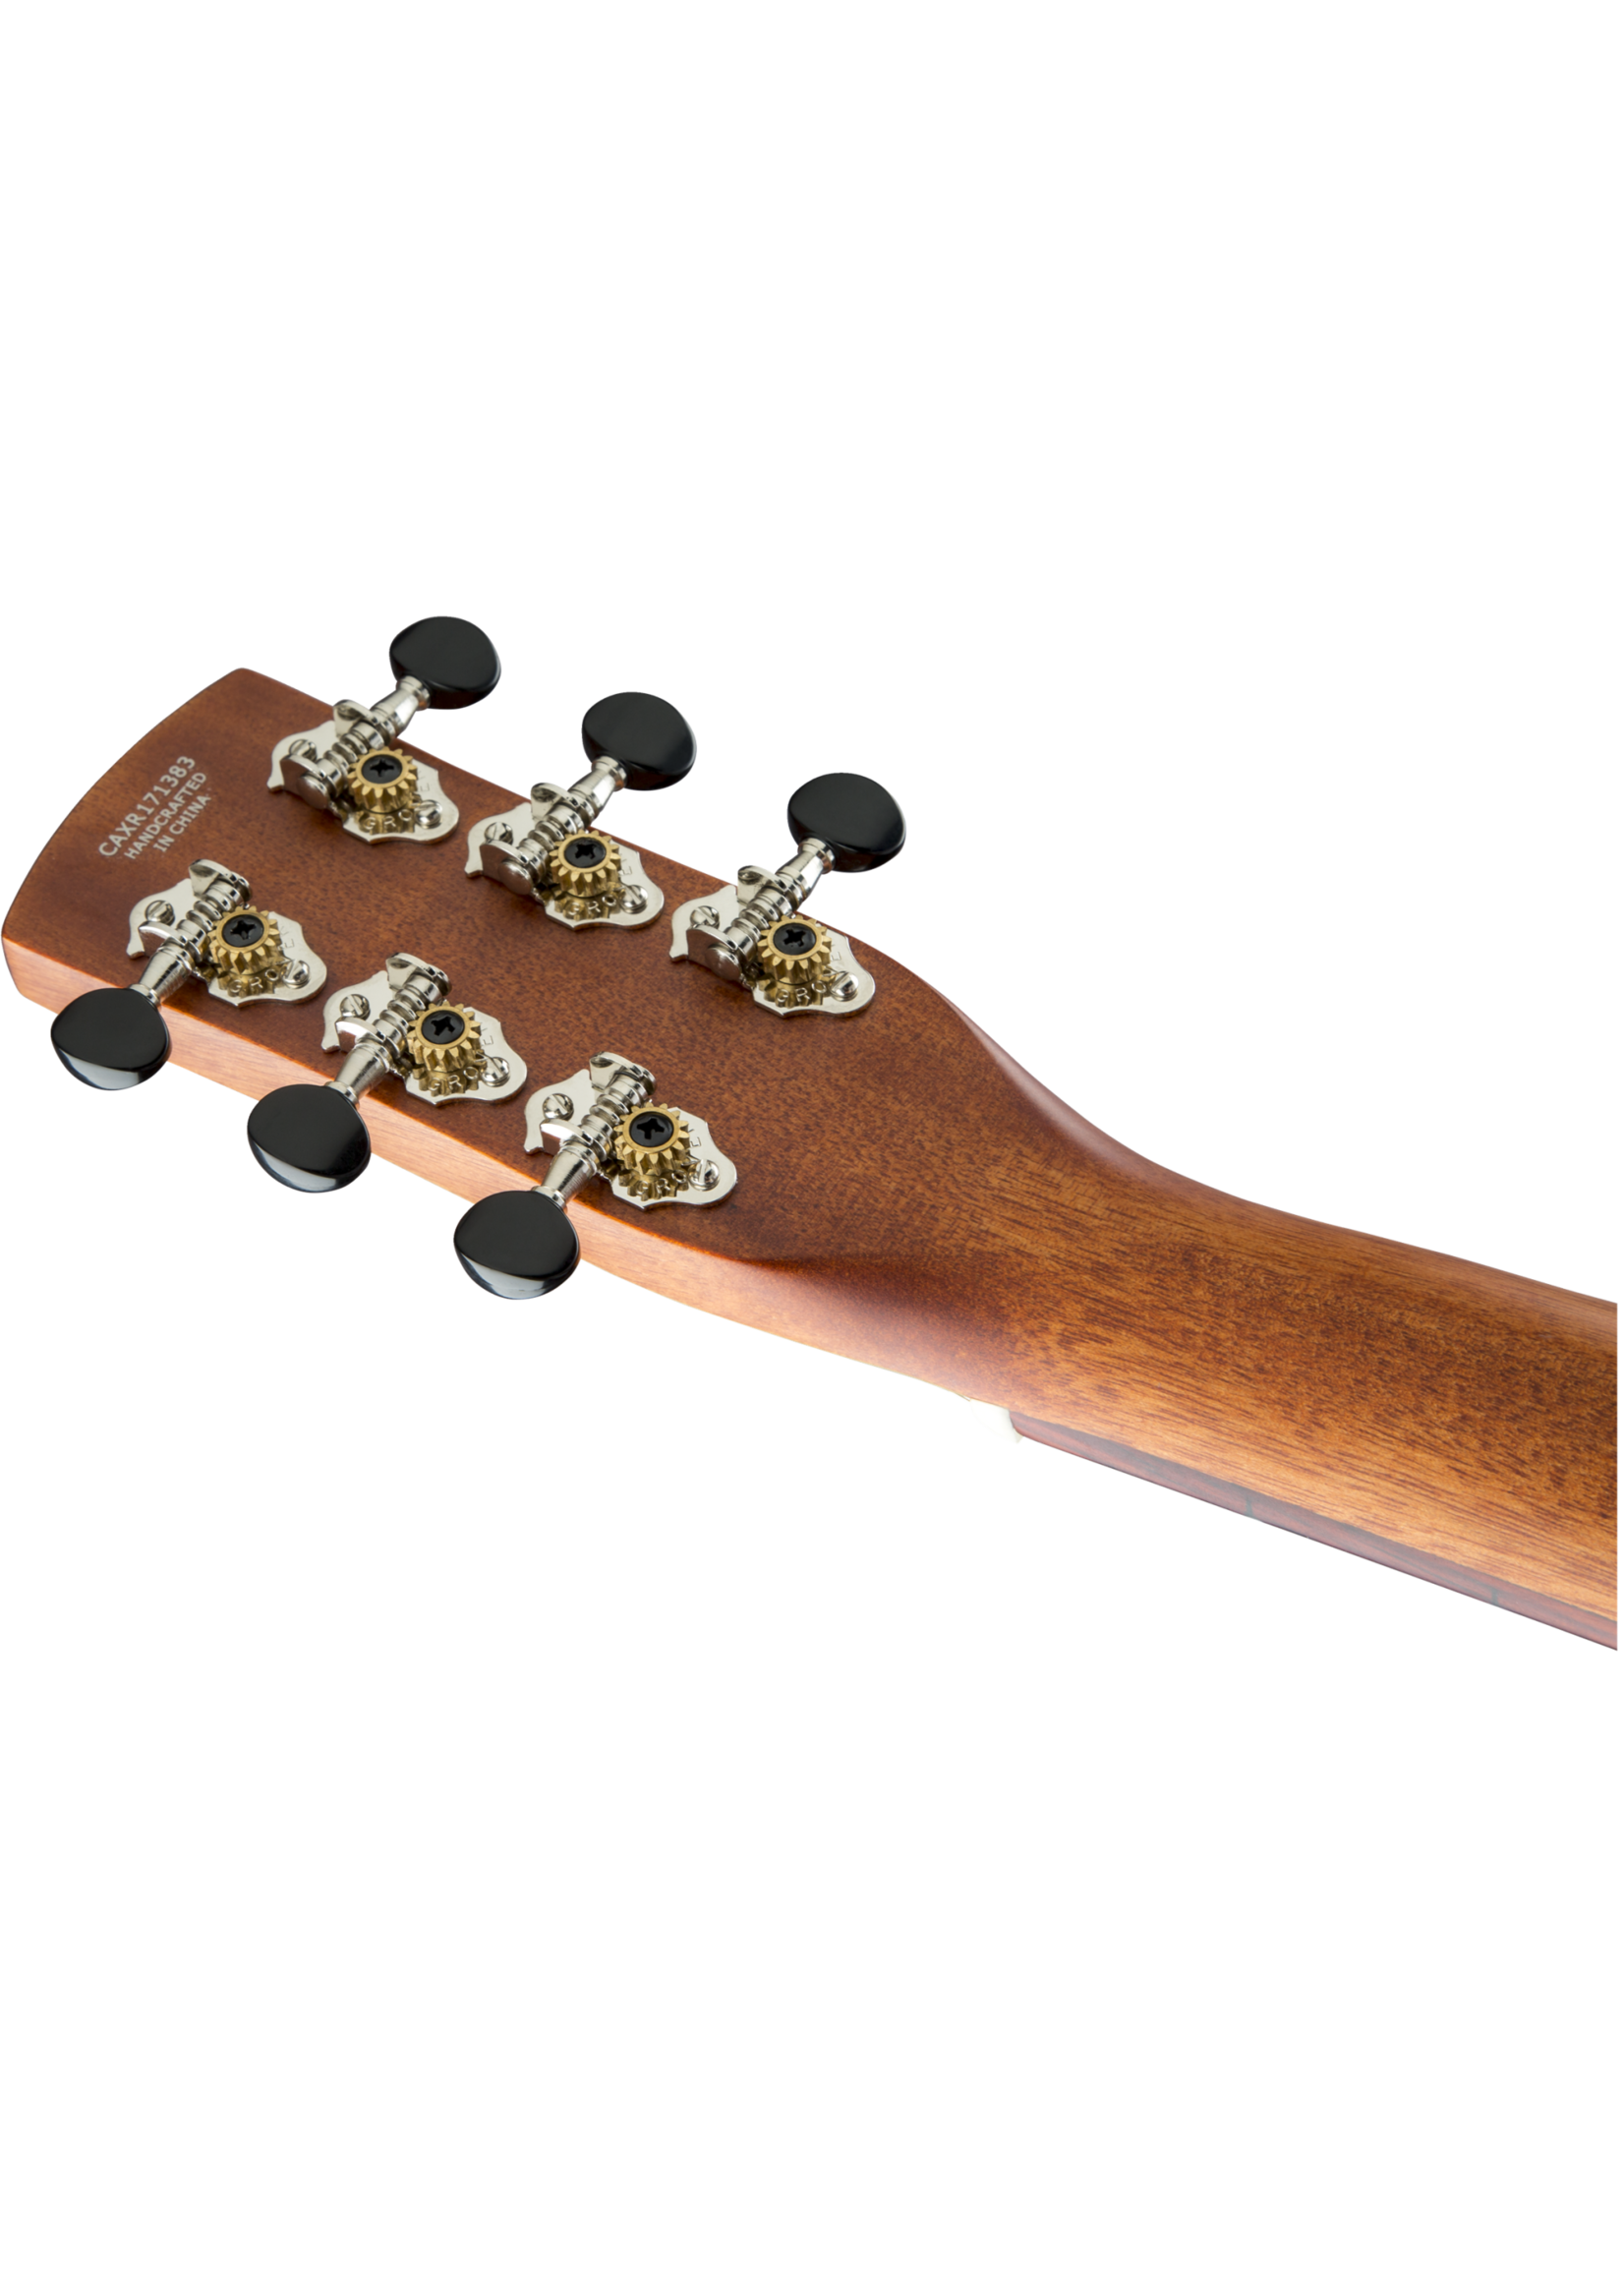 Gretsch Gretsch G9201 Honey Dipper Round-Neck Acoustic Resonator Guitar